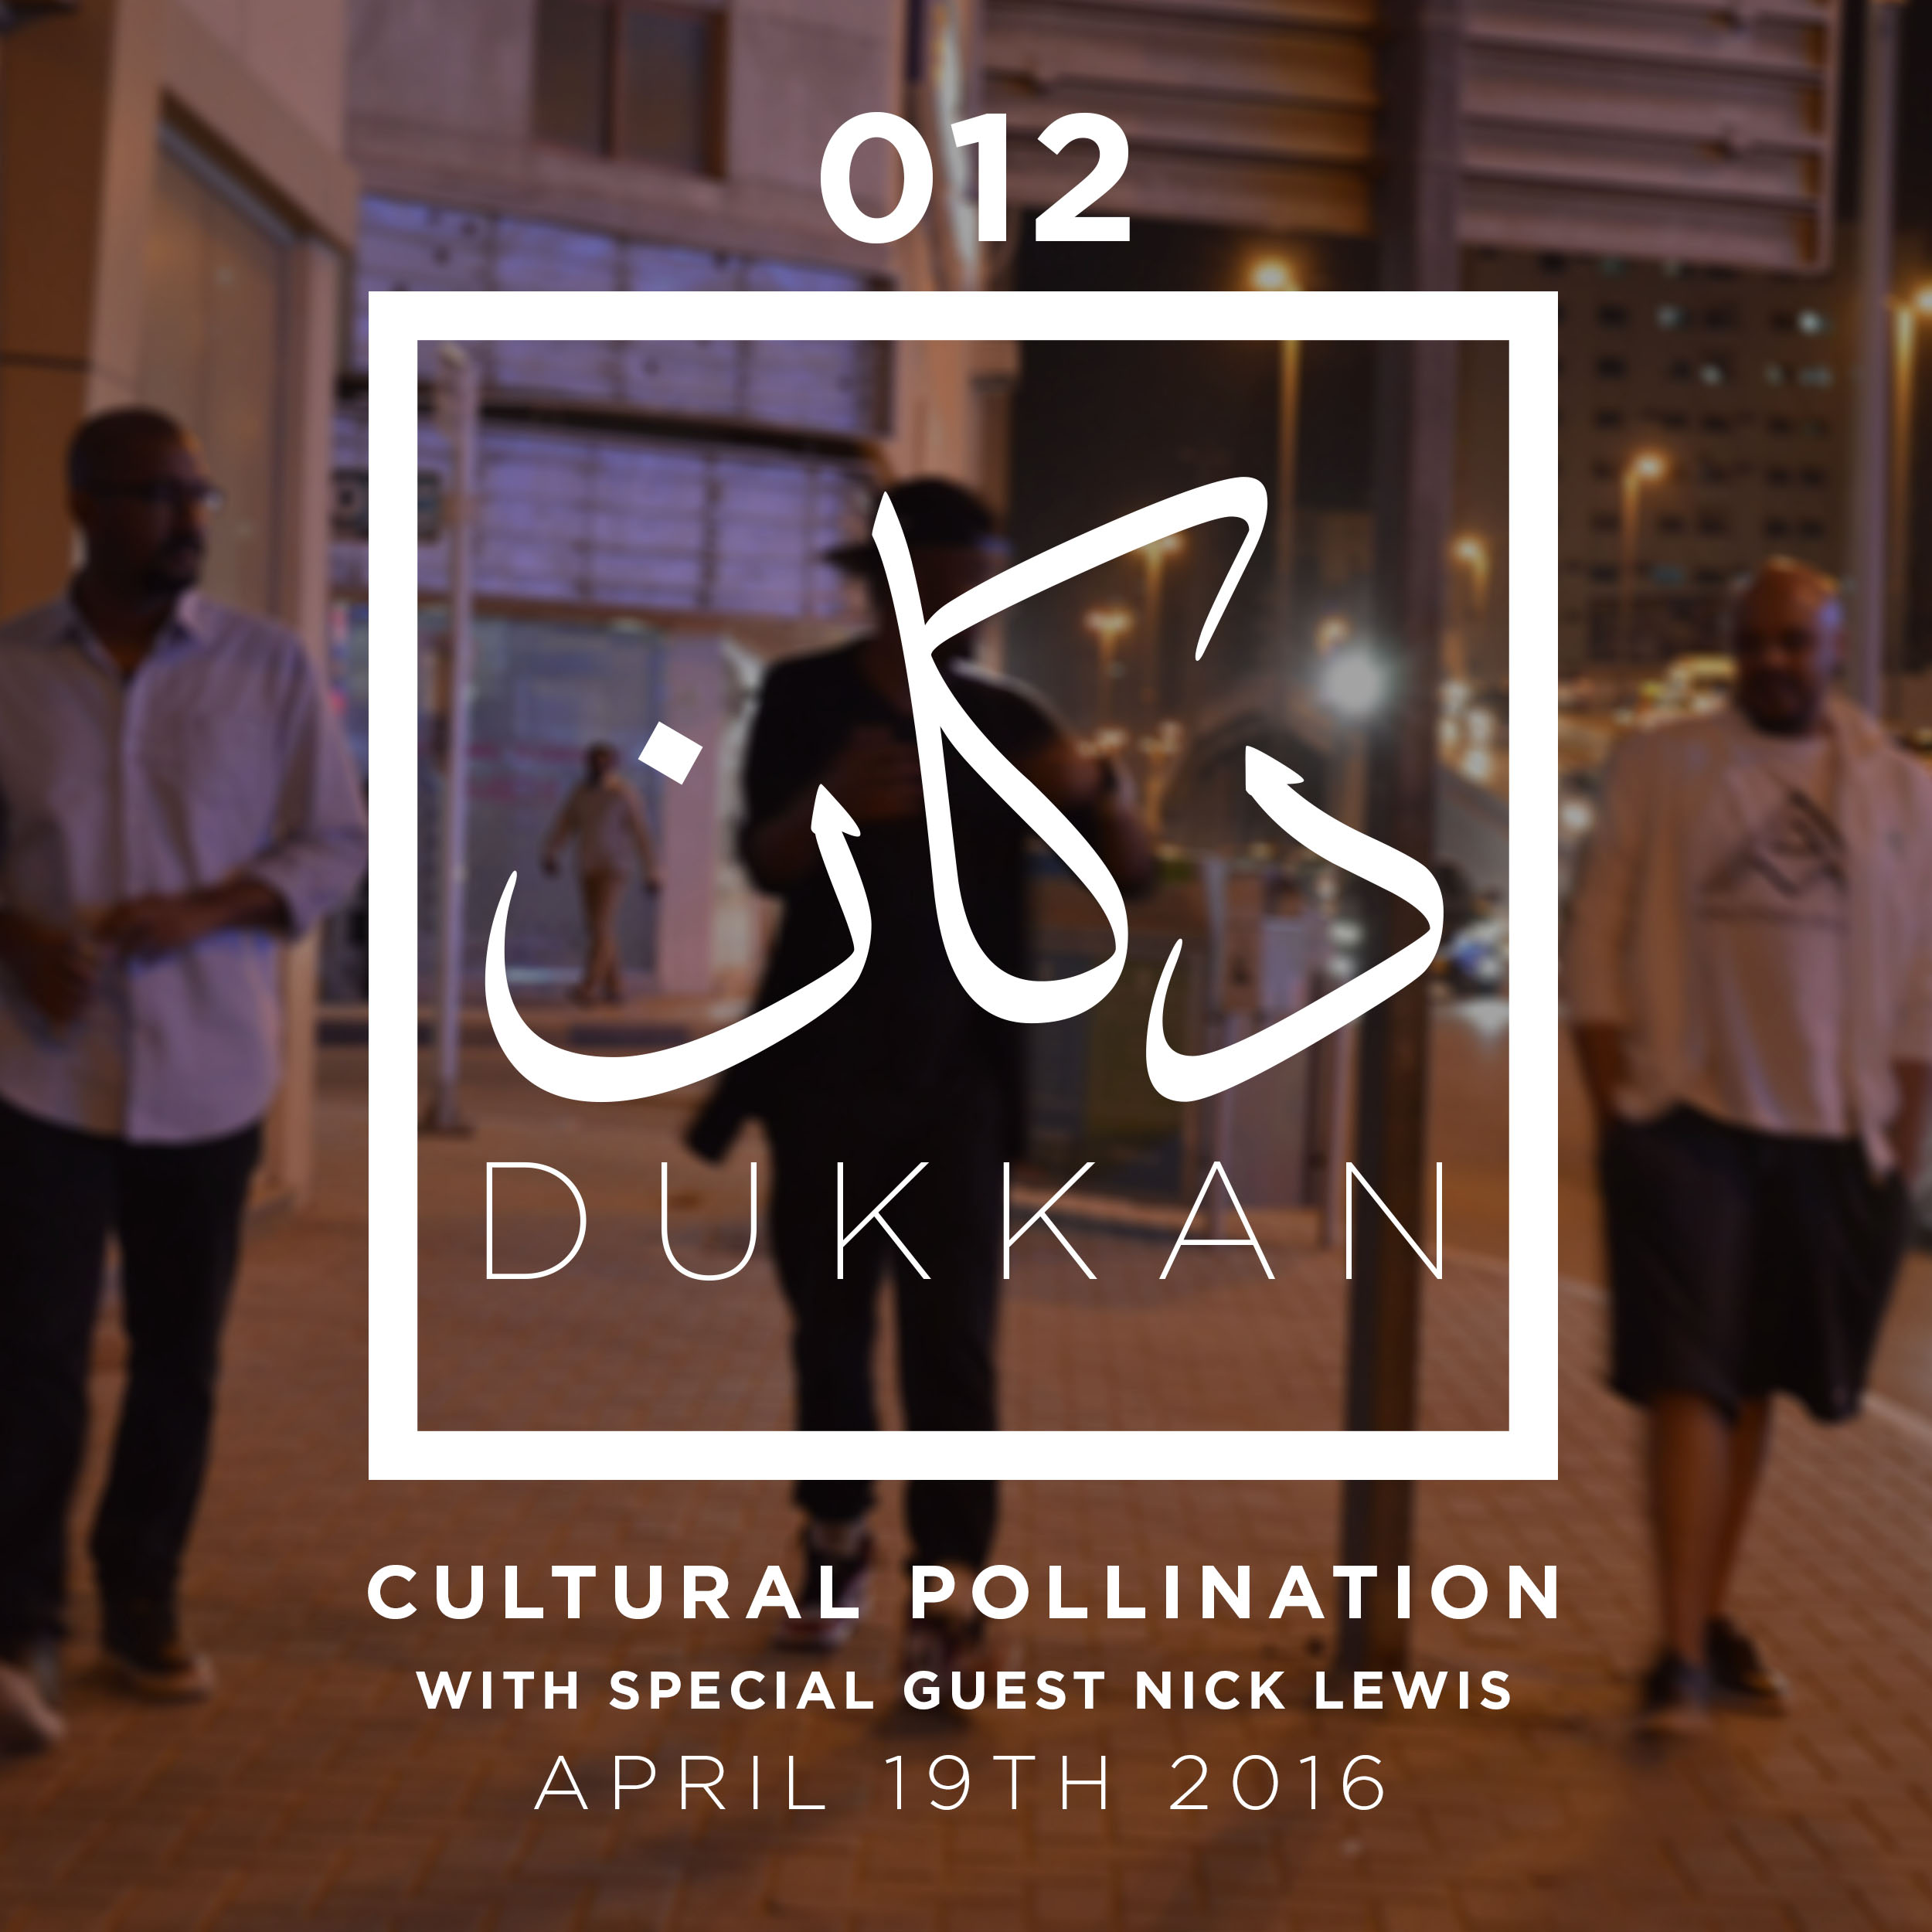 cultural pollination